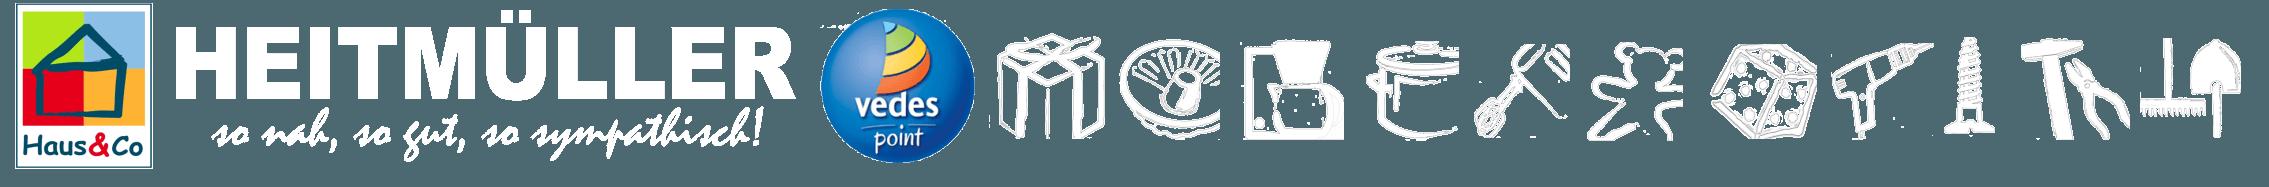 heitmueller24.de Logo